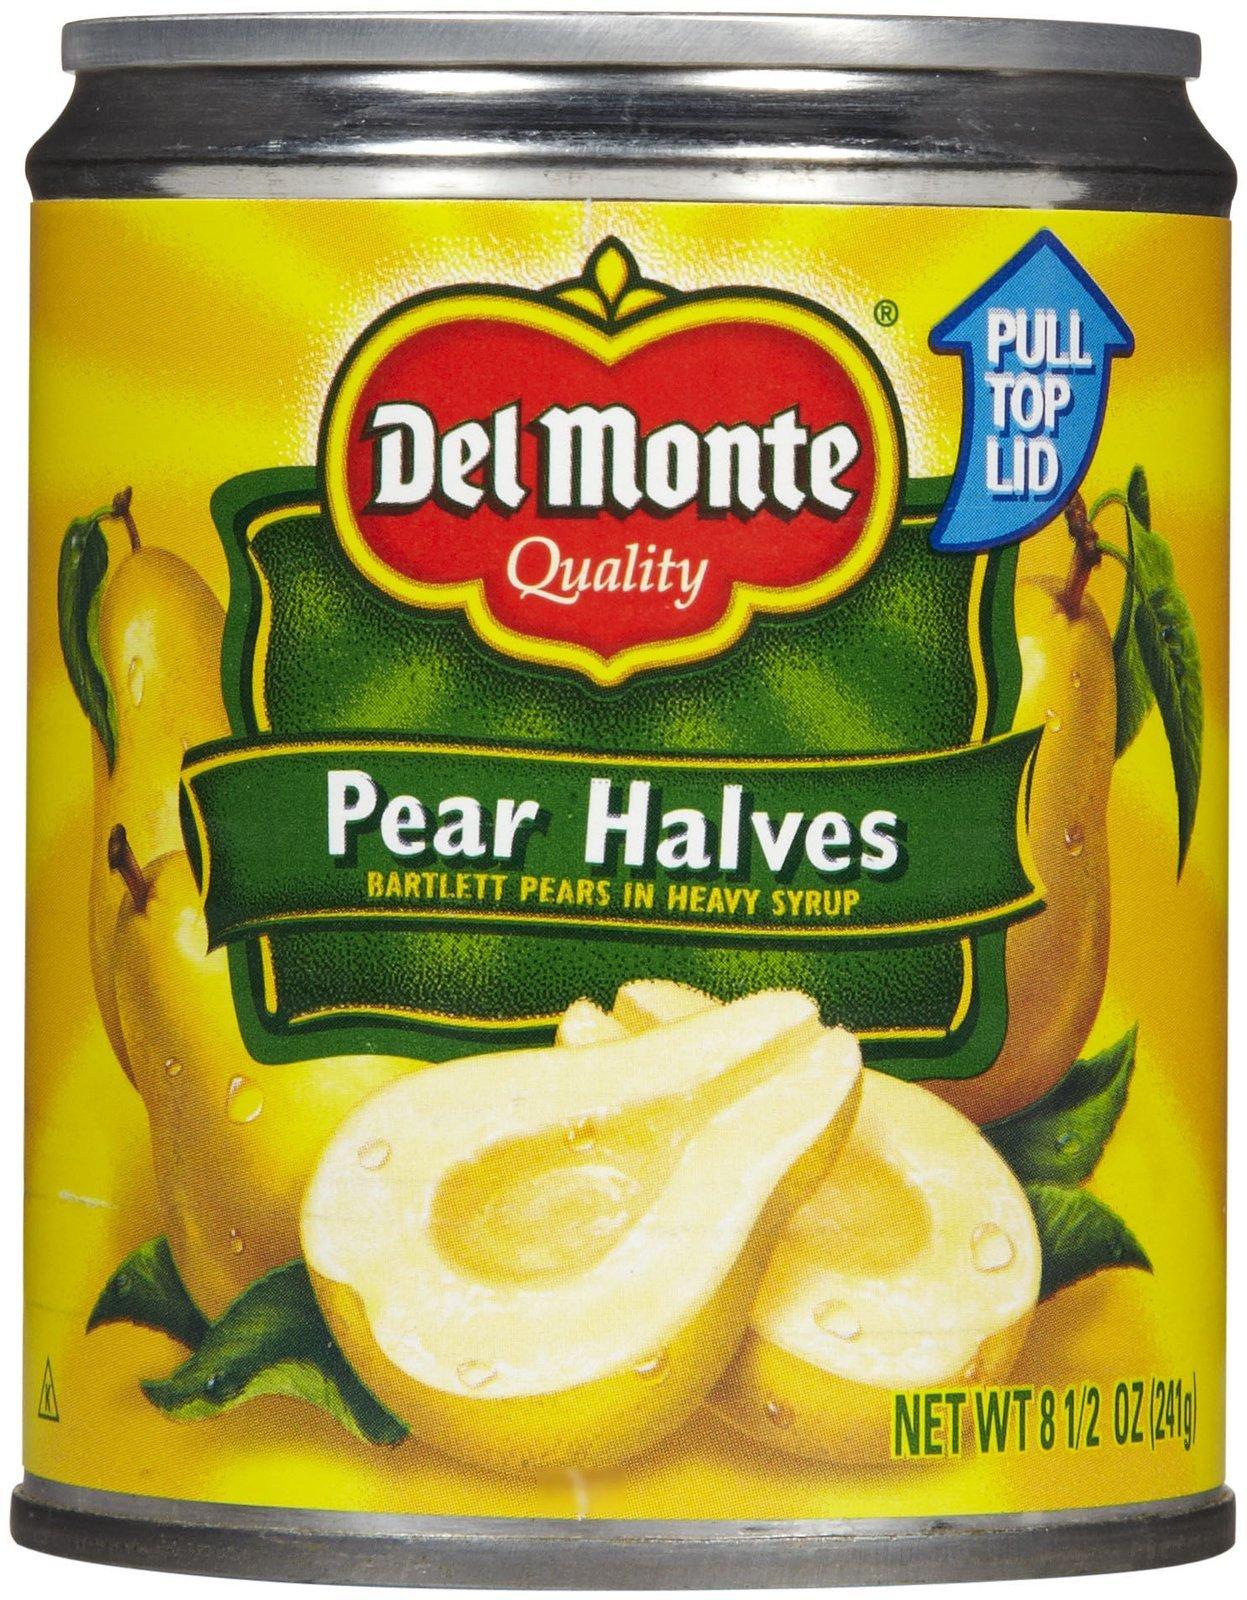 Del Monte Bartlett Pear Halves in Heavy Syrup - 8.5 oz